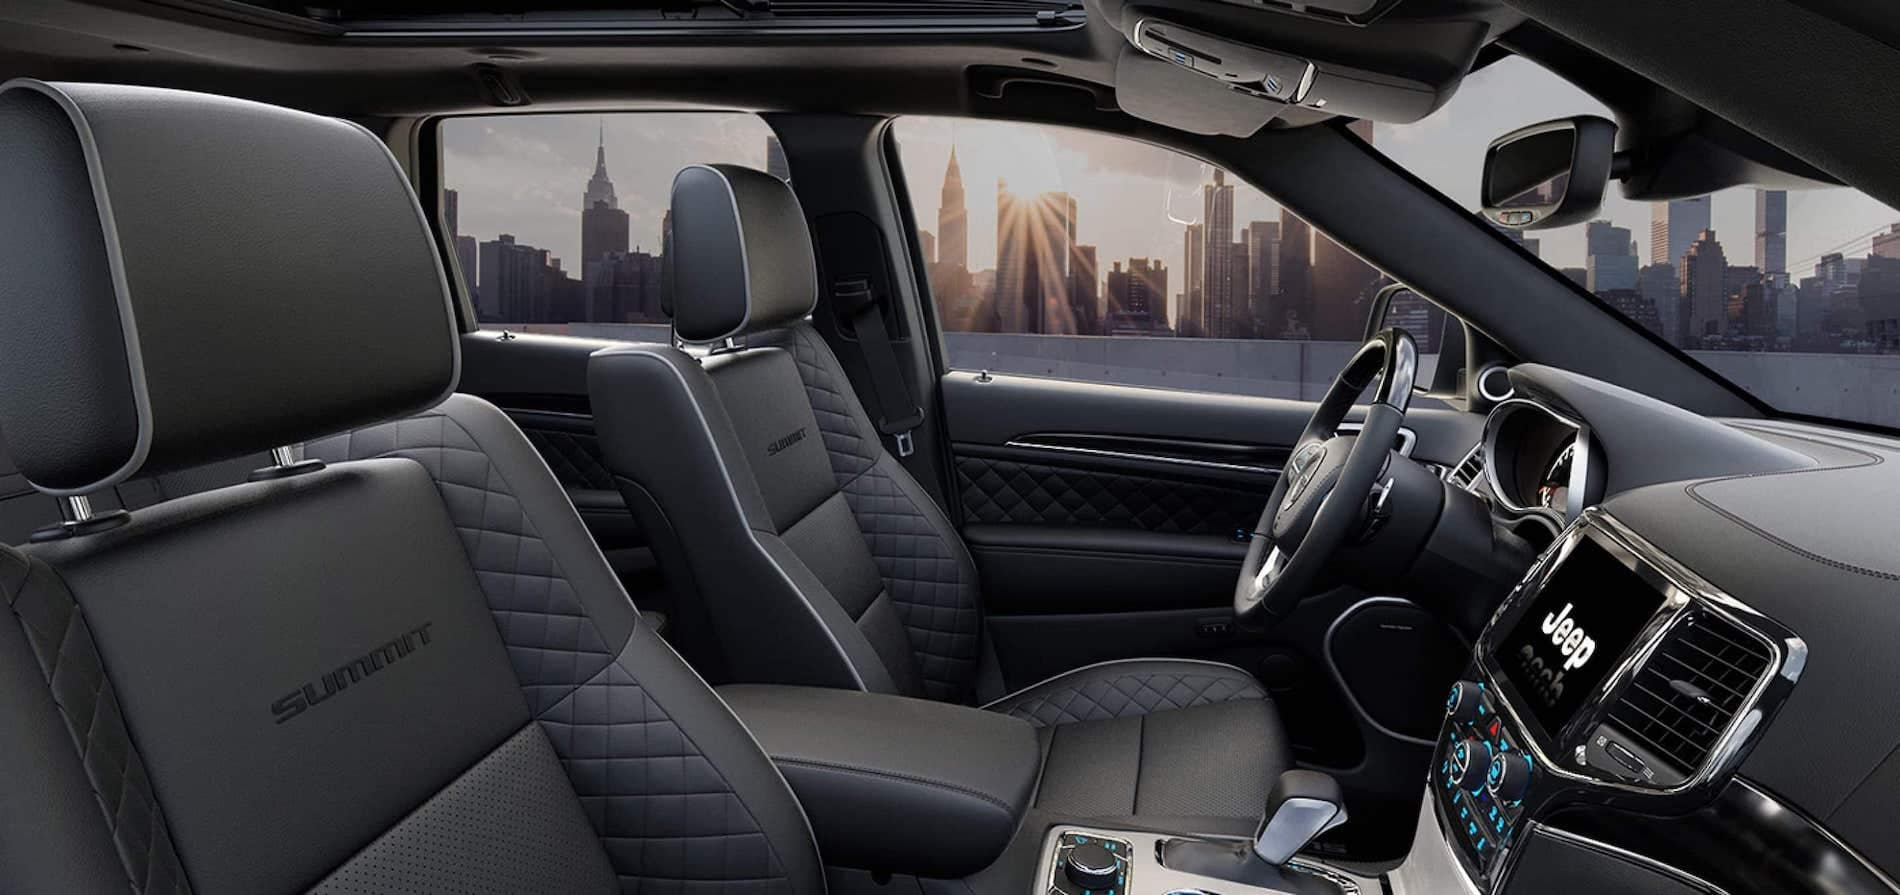 2021 Jeep Grande Cherokee Interior available in Springfield VA